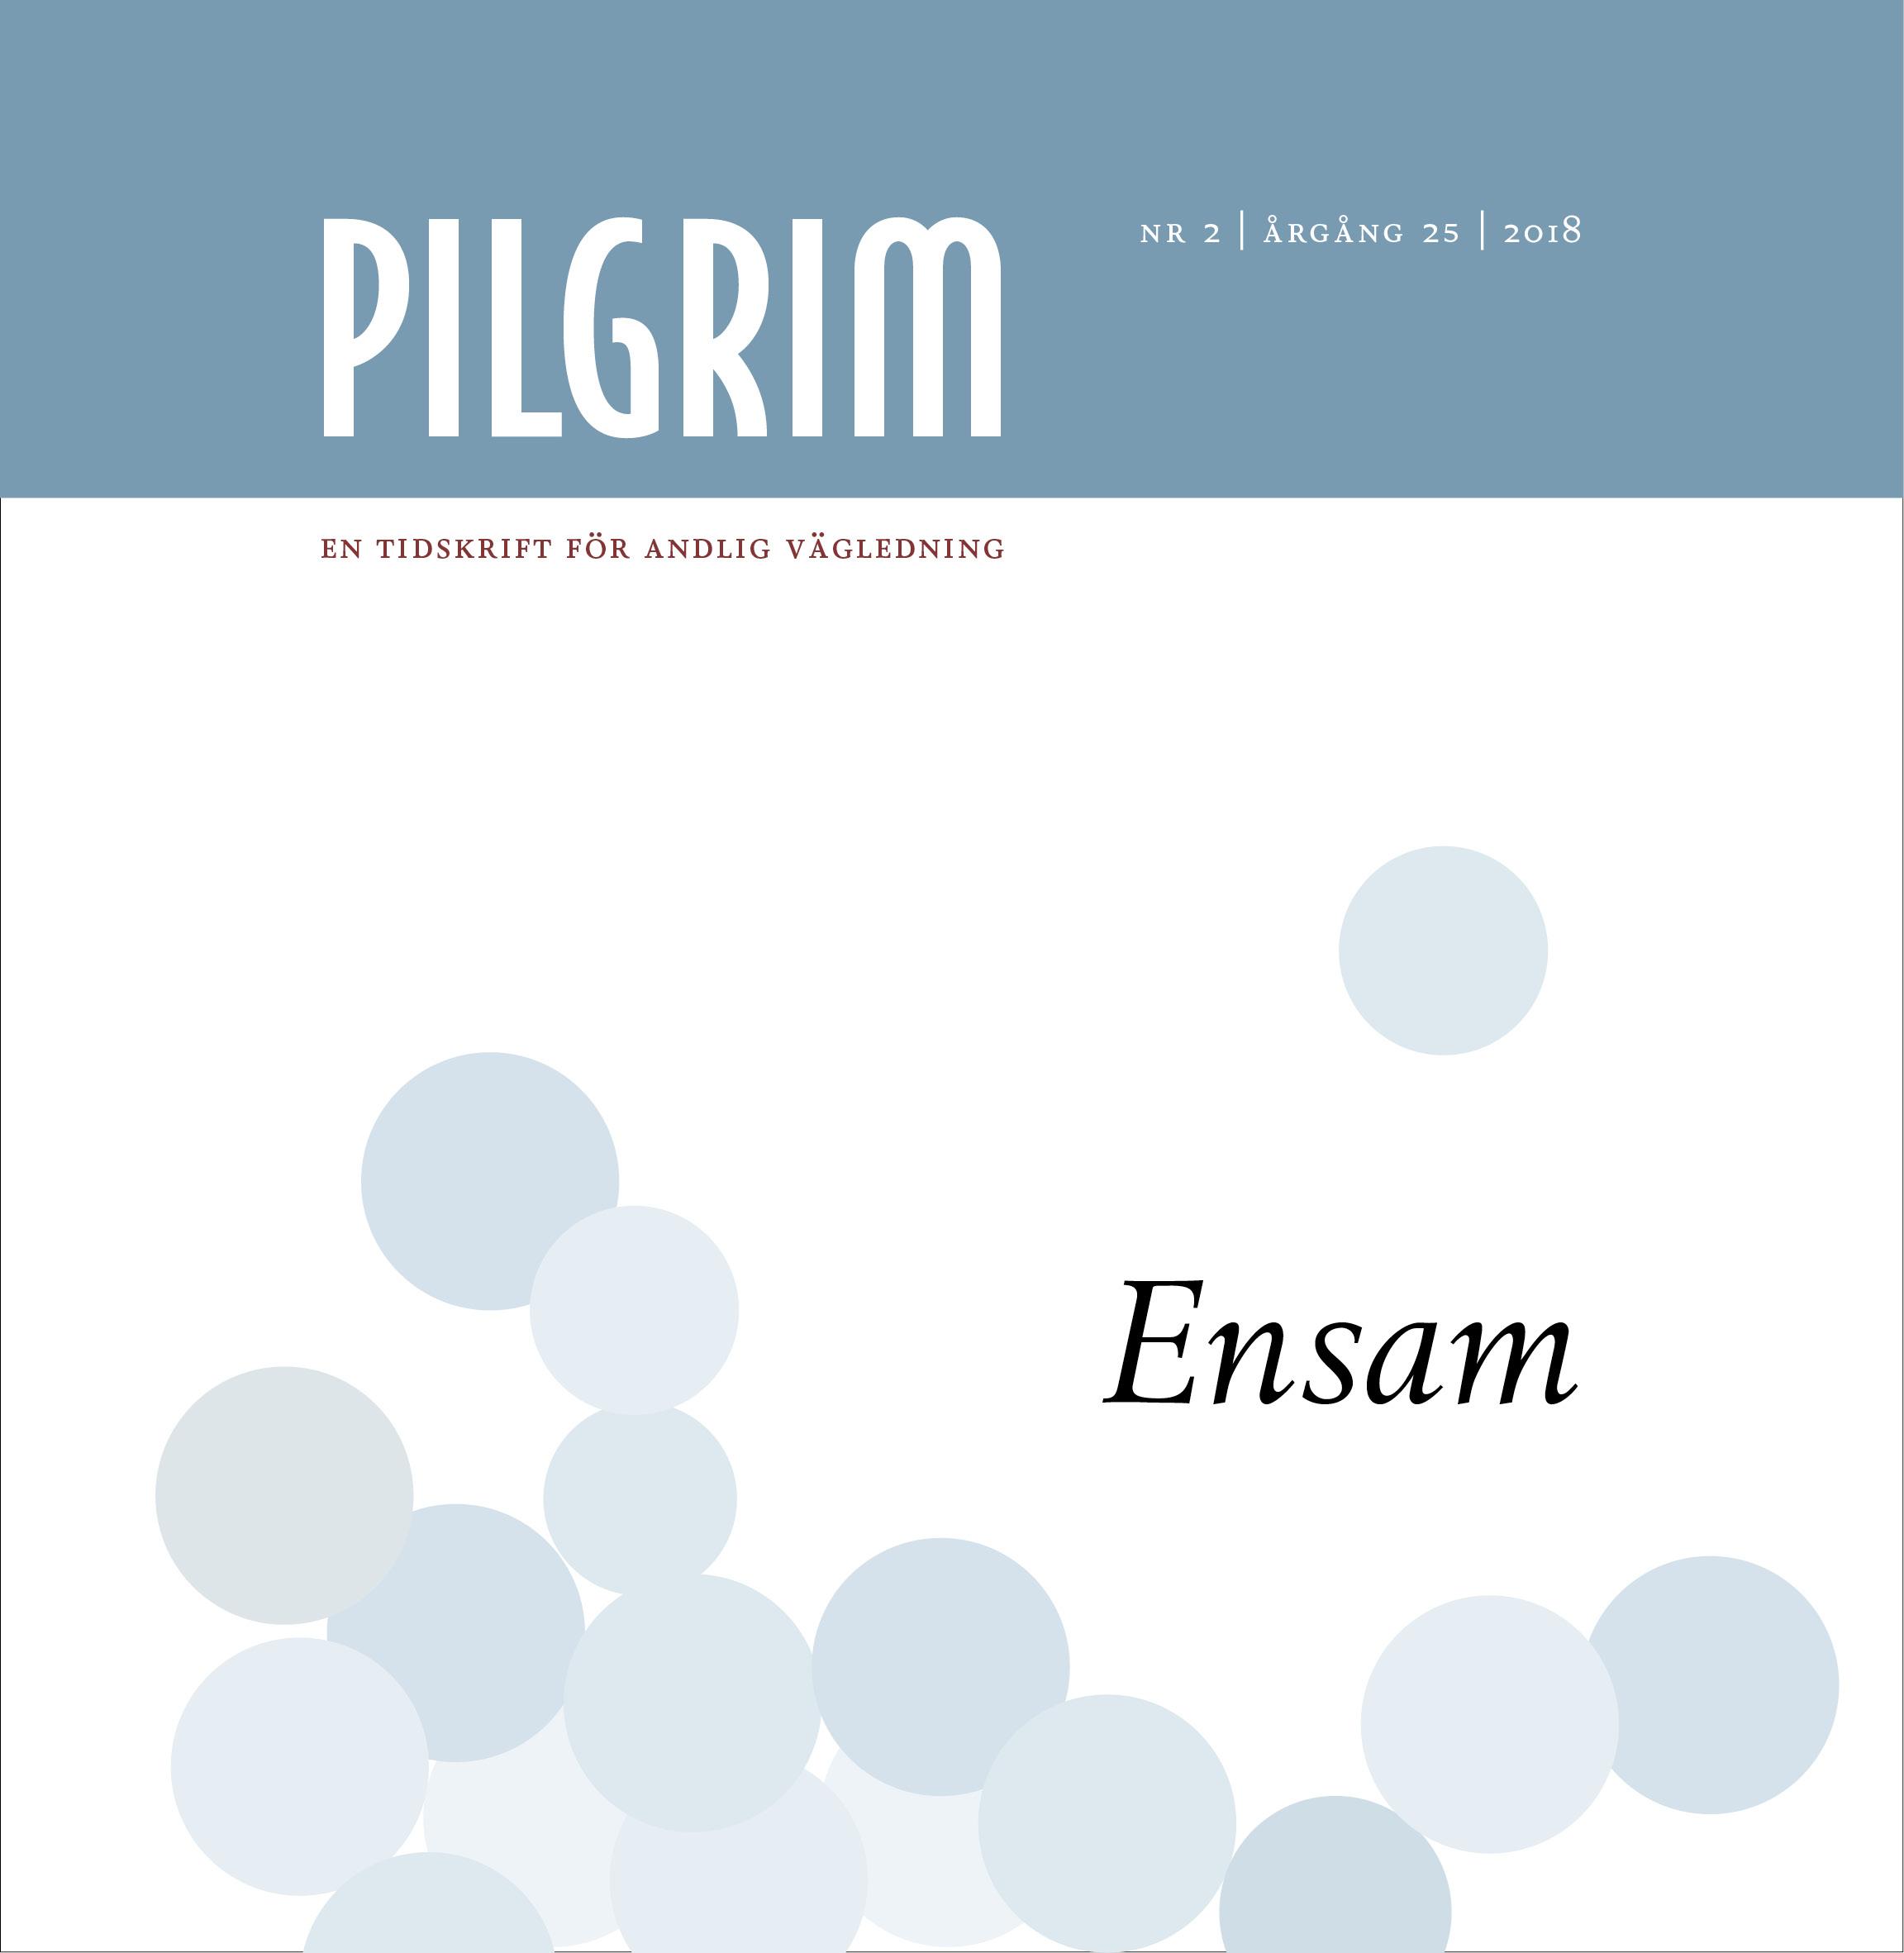 Pilgrim frams 2018-2